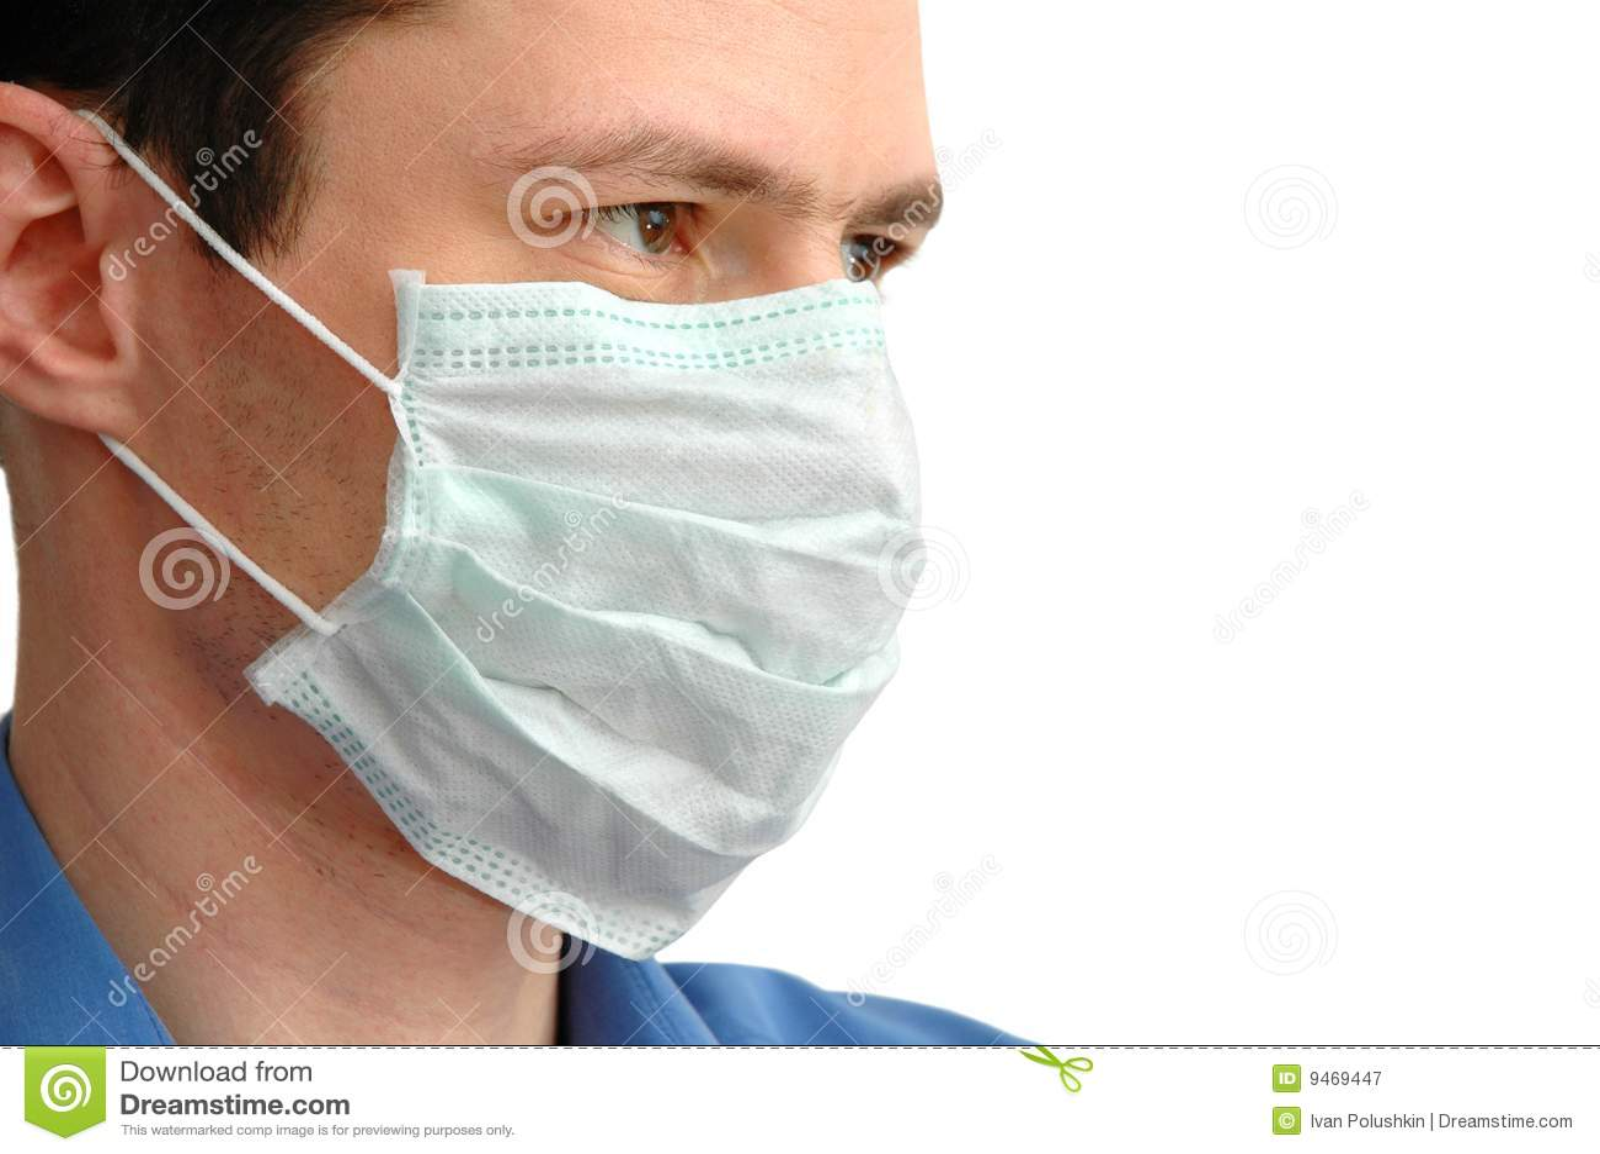 mdecin-dans-le-masque-9469447